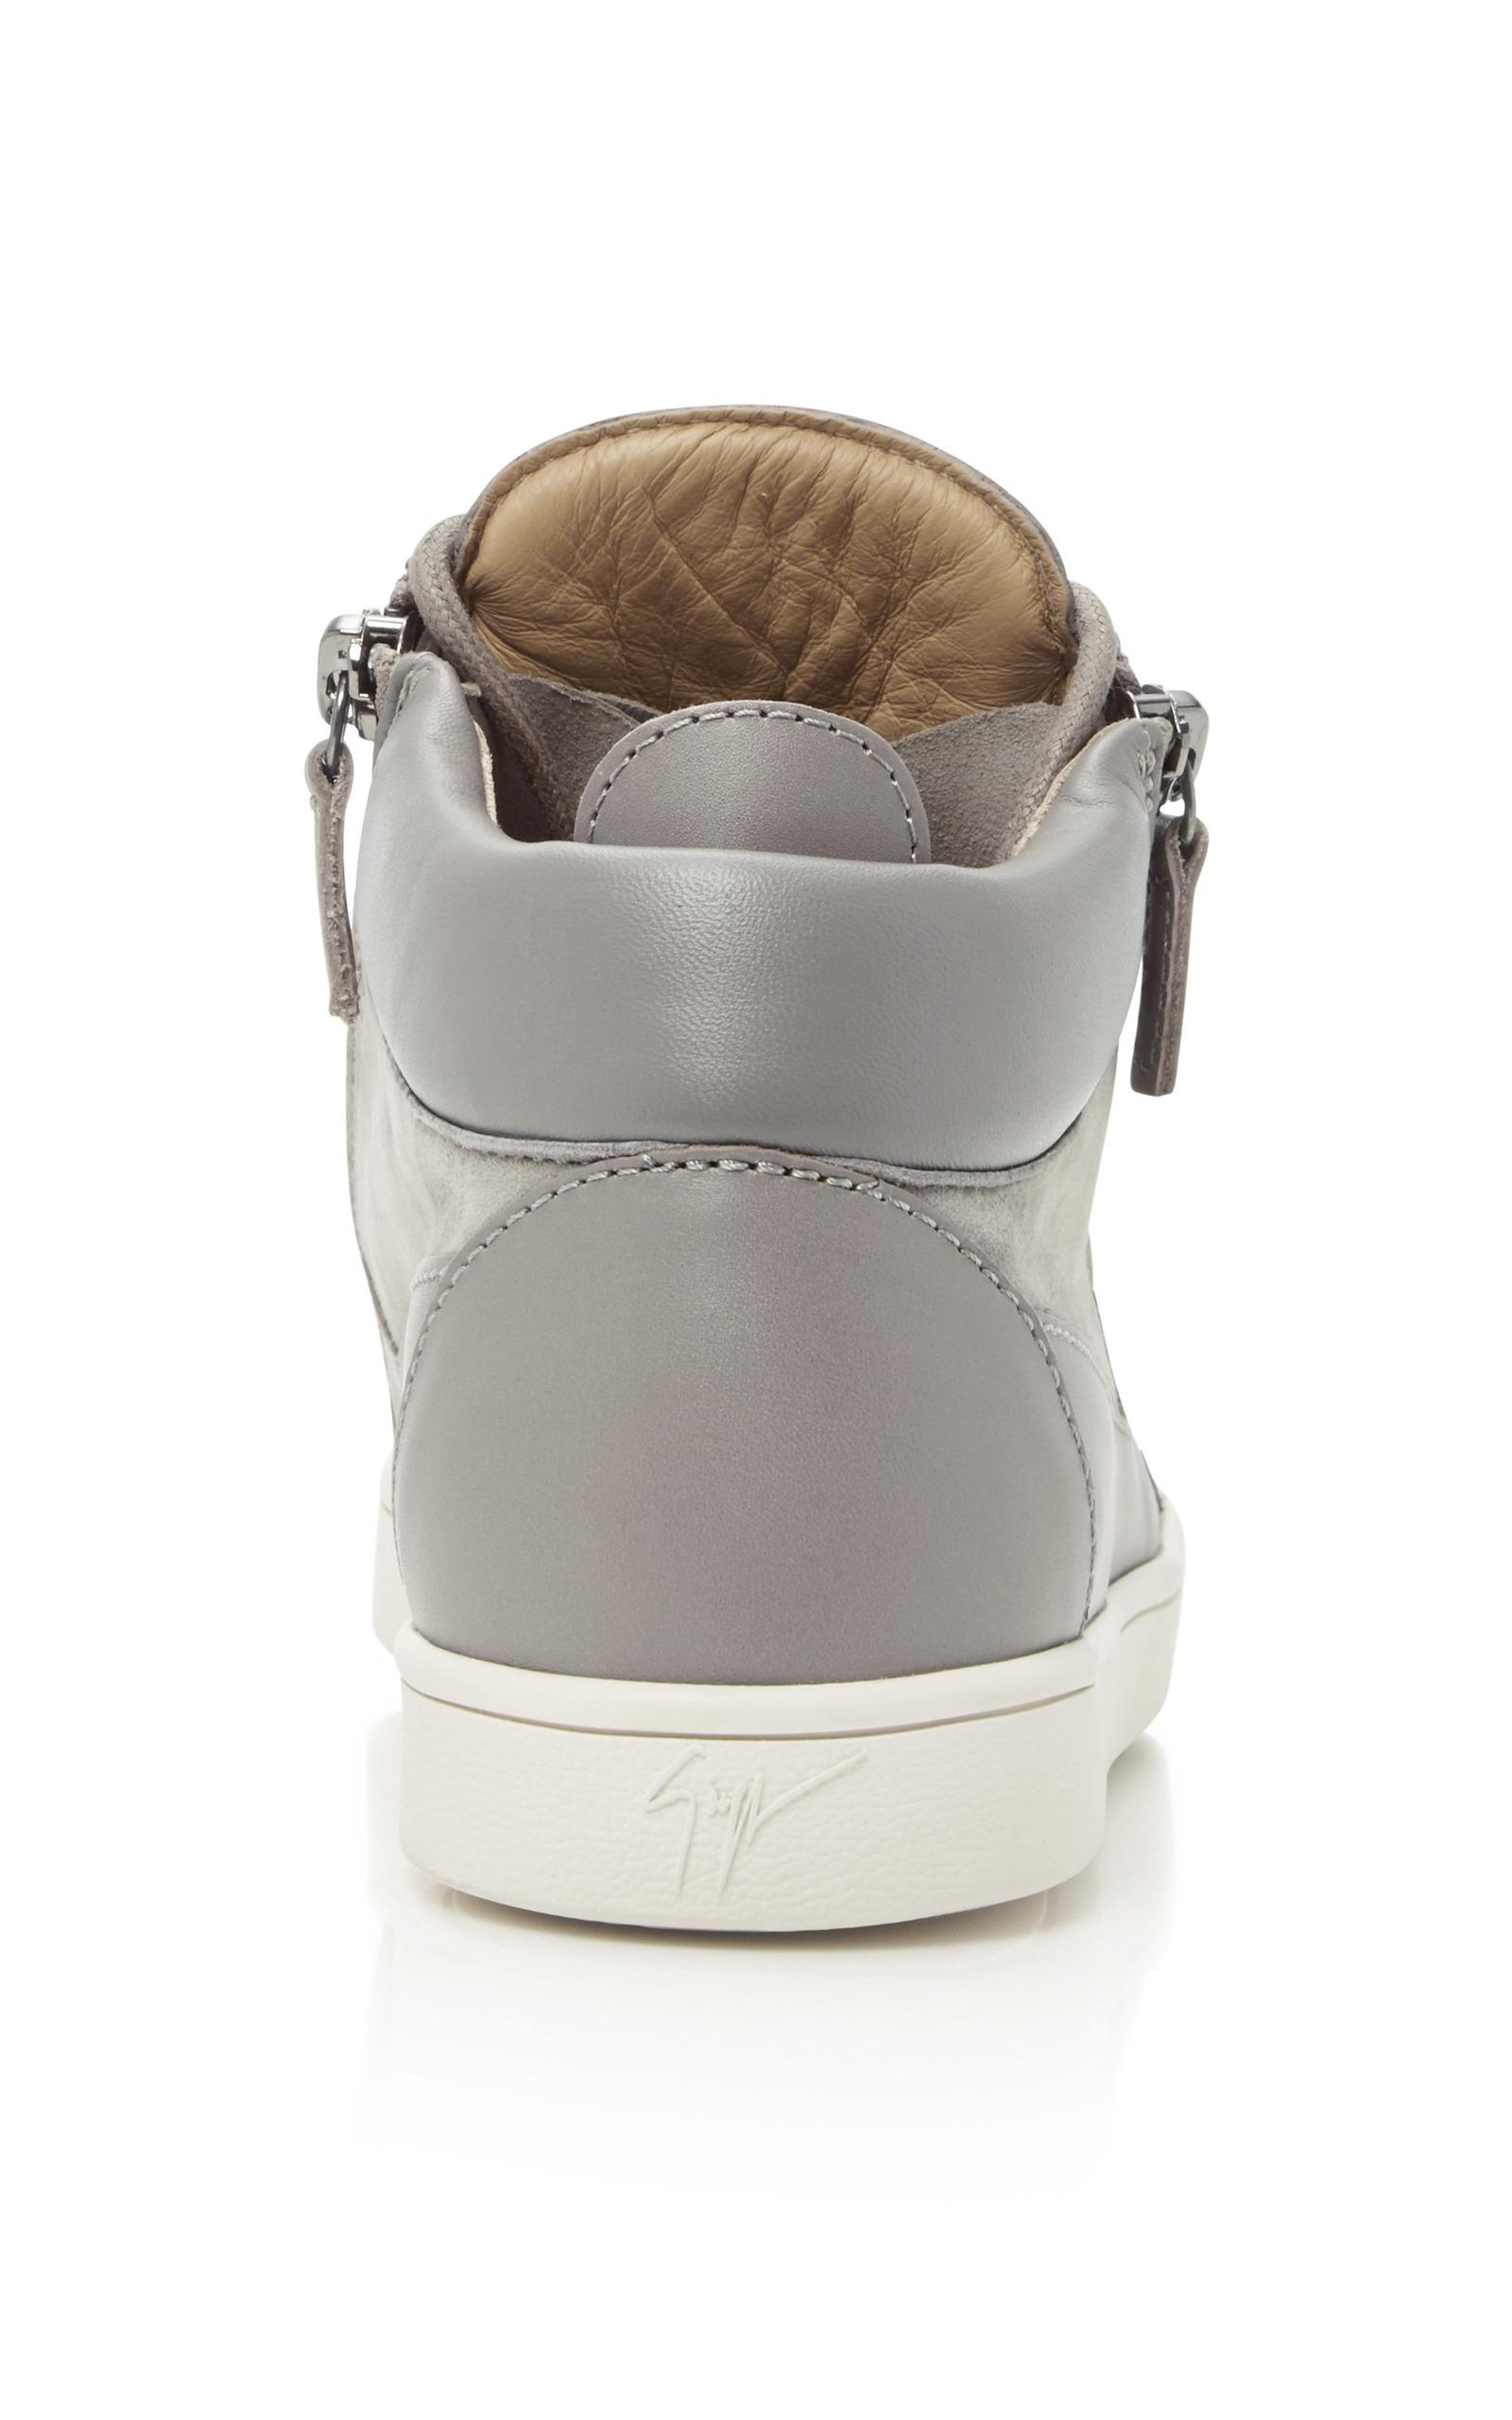 5c220bdb170a Giuseppe ZanottiSloane Suede and Leather Sneakers. CLOSE. Loading. Loading.  Loading. Loading